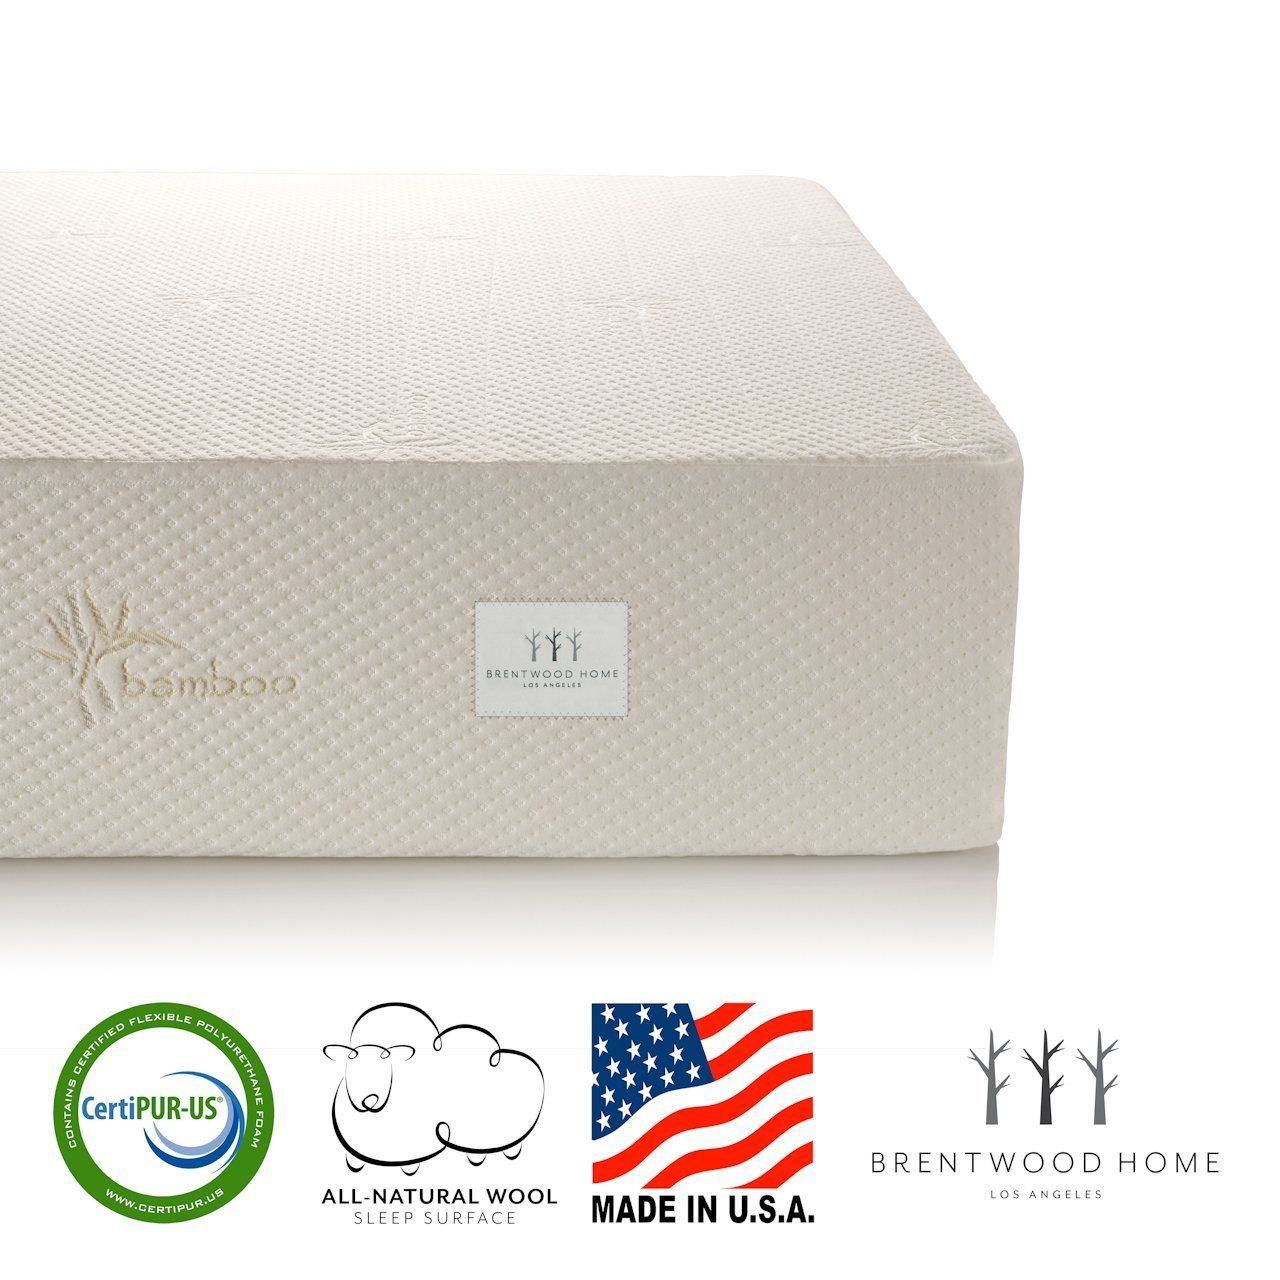 Amazon Com Brentwood Home Bamboo Mattress Gel Memory Foam 13 Inch Queen Kitchen Amp Dining Beste Matratze Schaummatratze